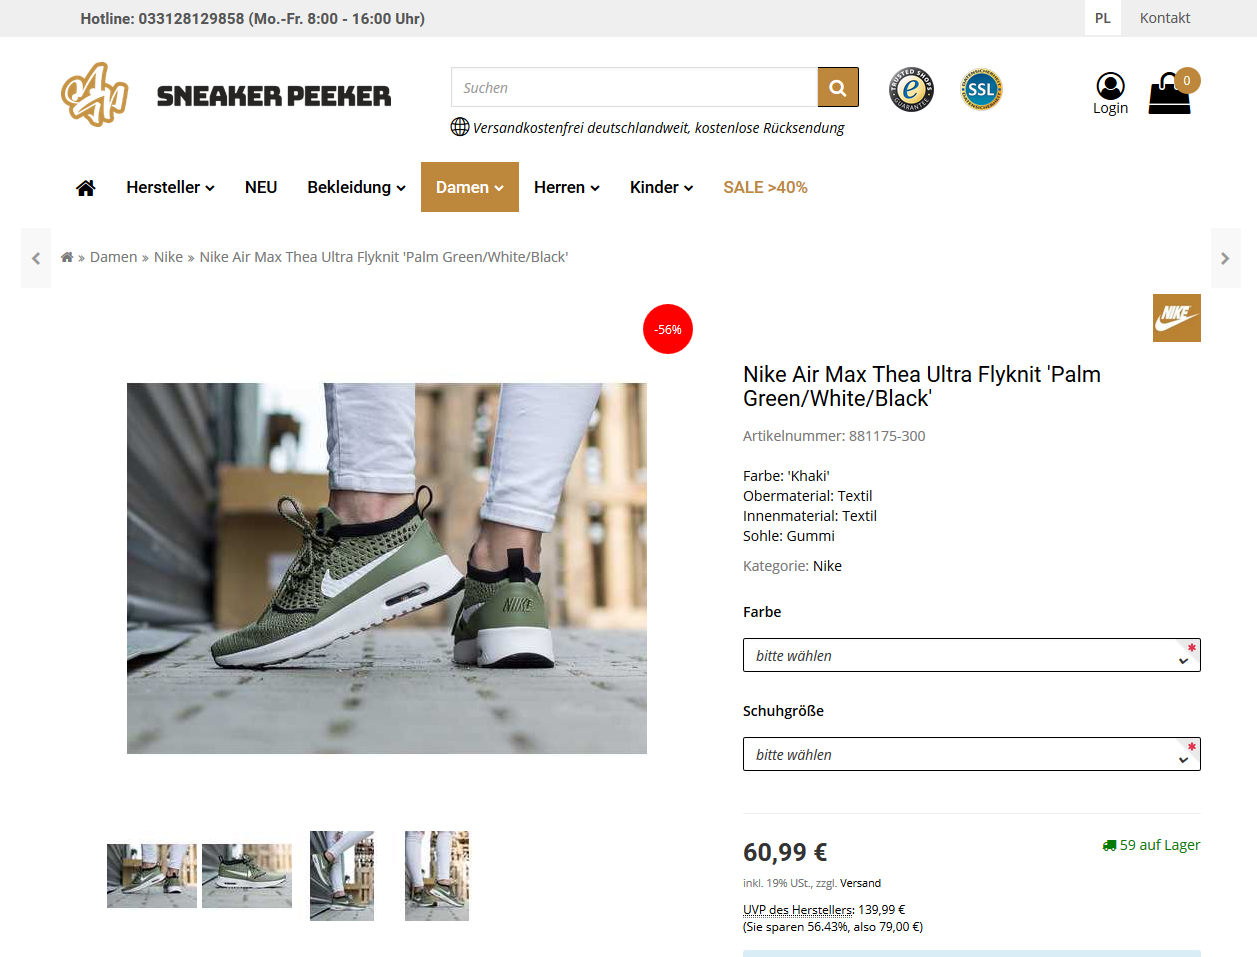 Nike Air Max Thea Flyknit palm greenblackwhite (Damen) (881175 300)